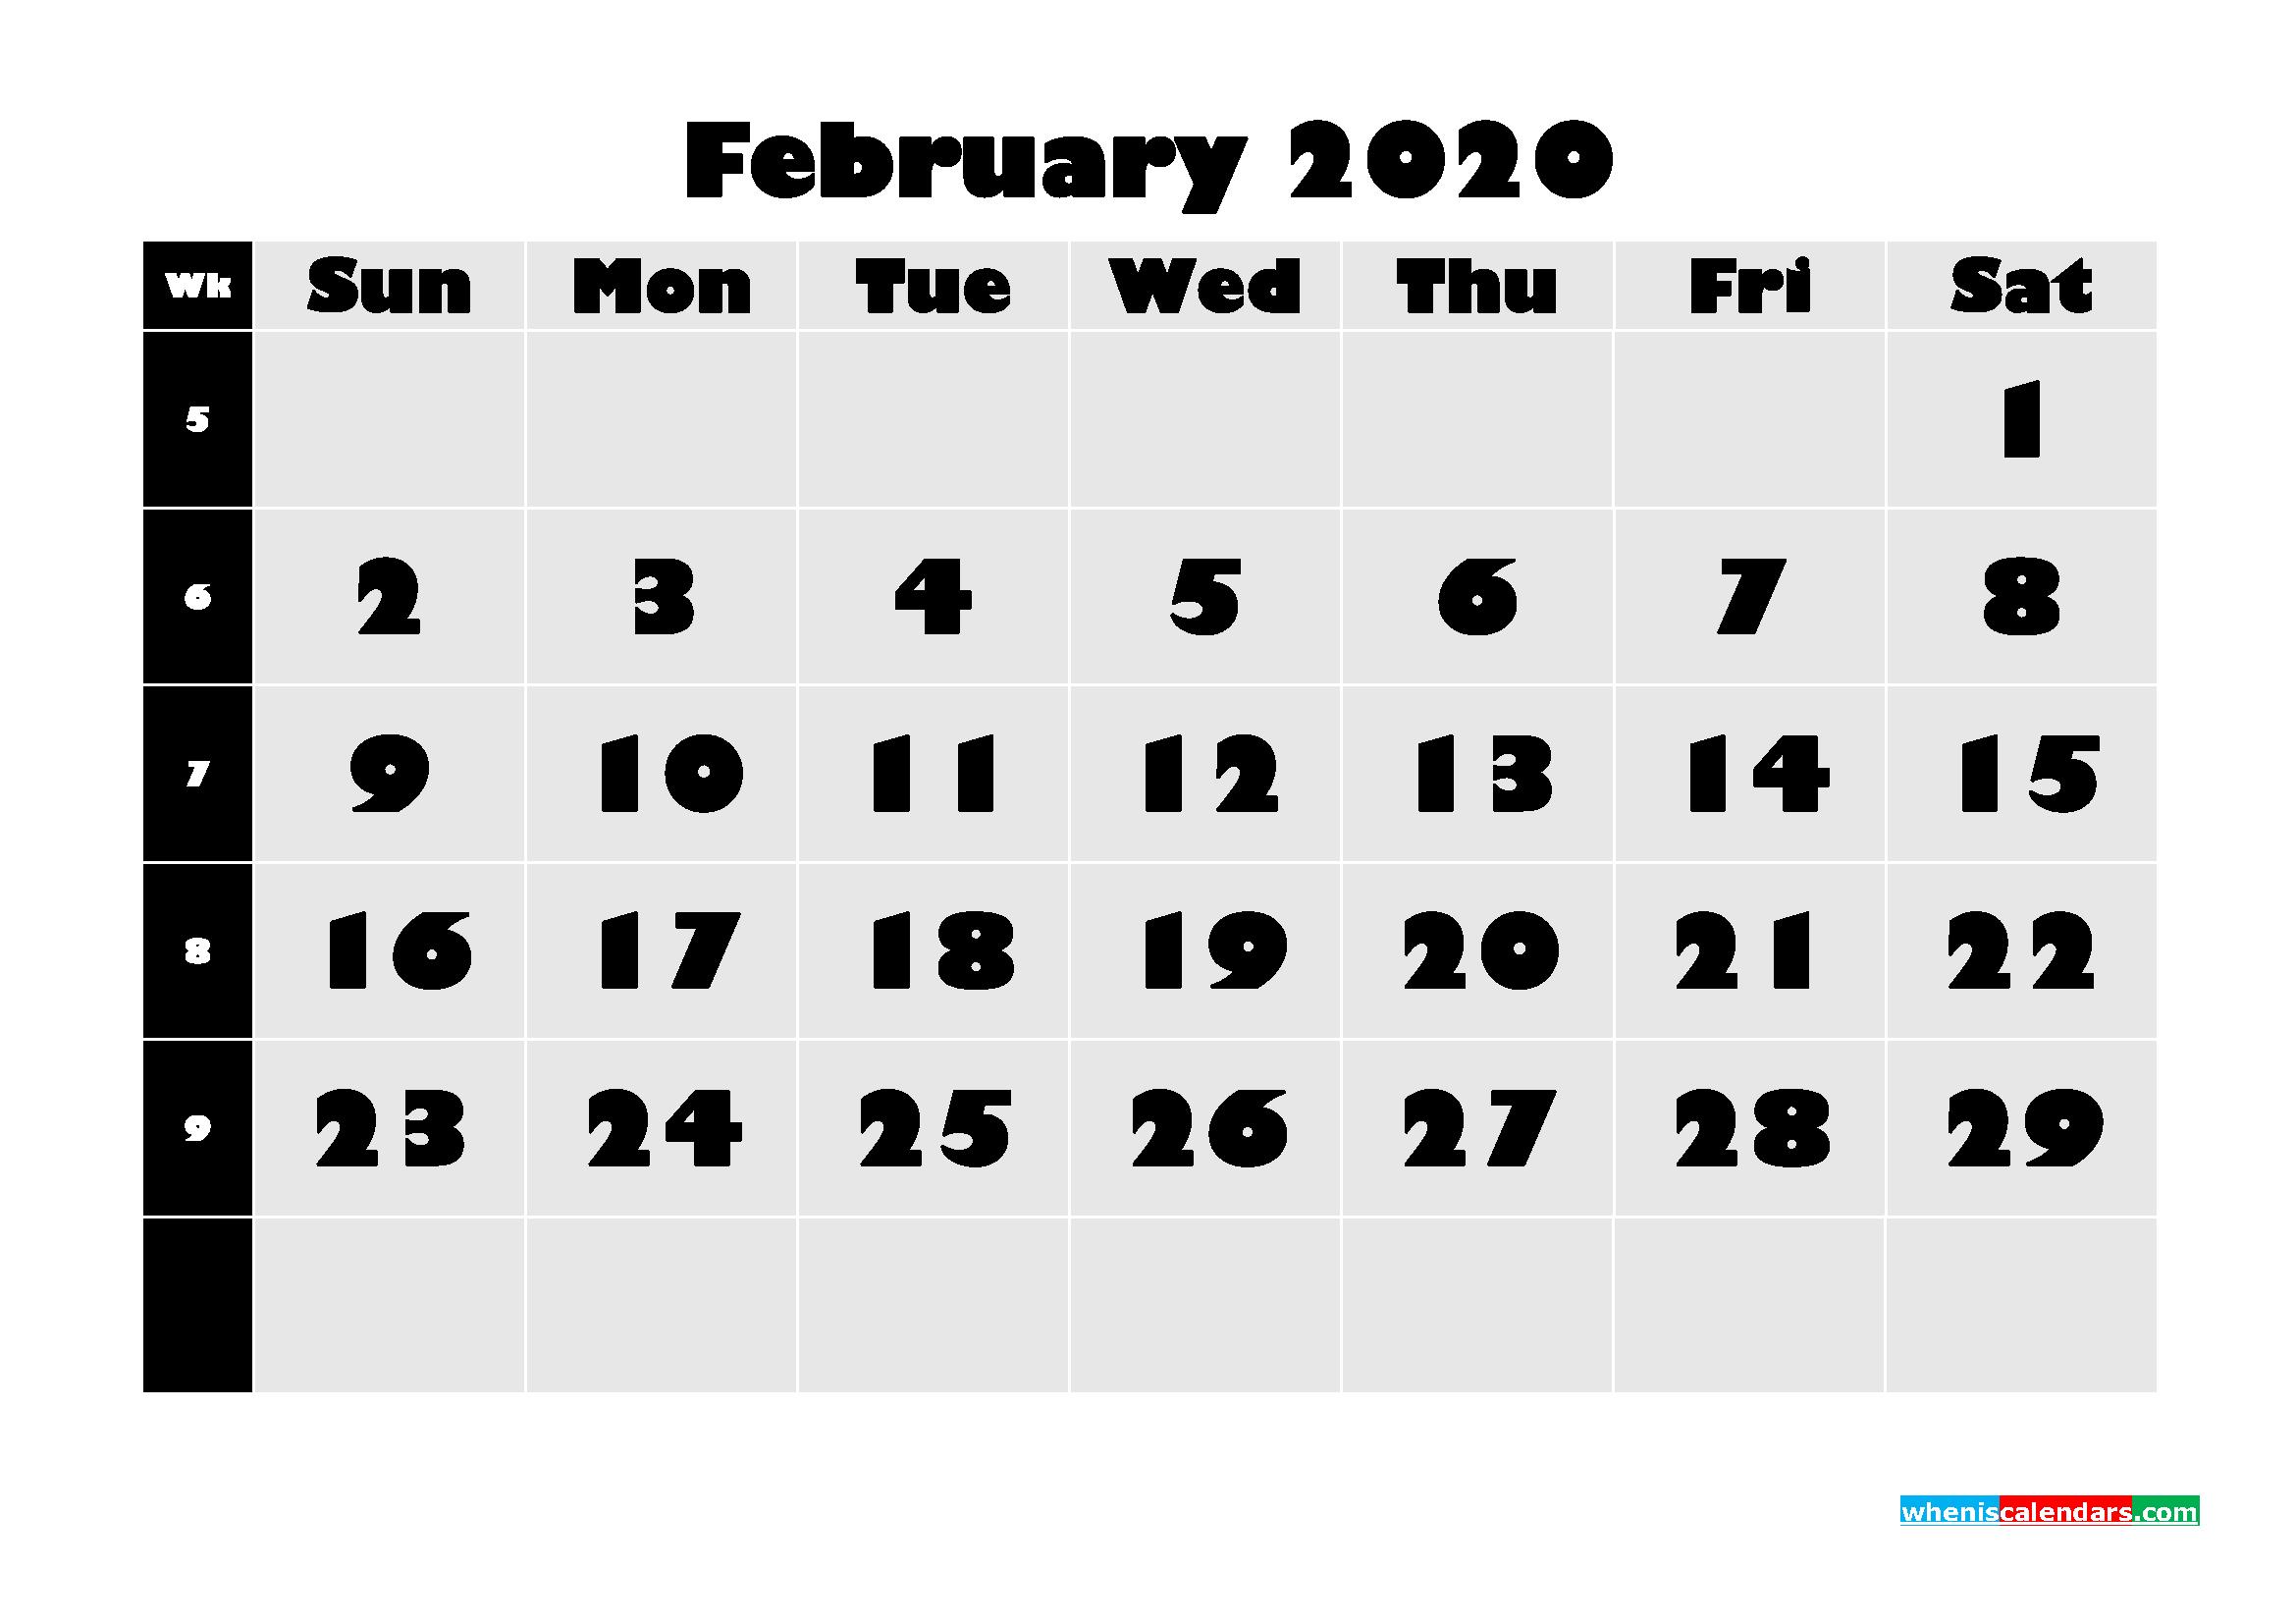 Blank February 2020 Calendar Printable - No.m20b626